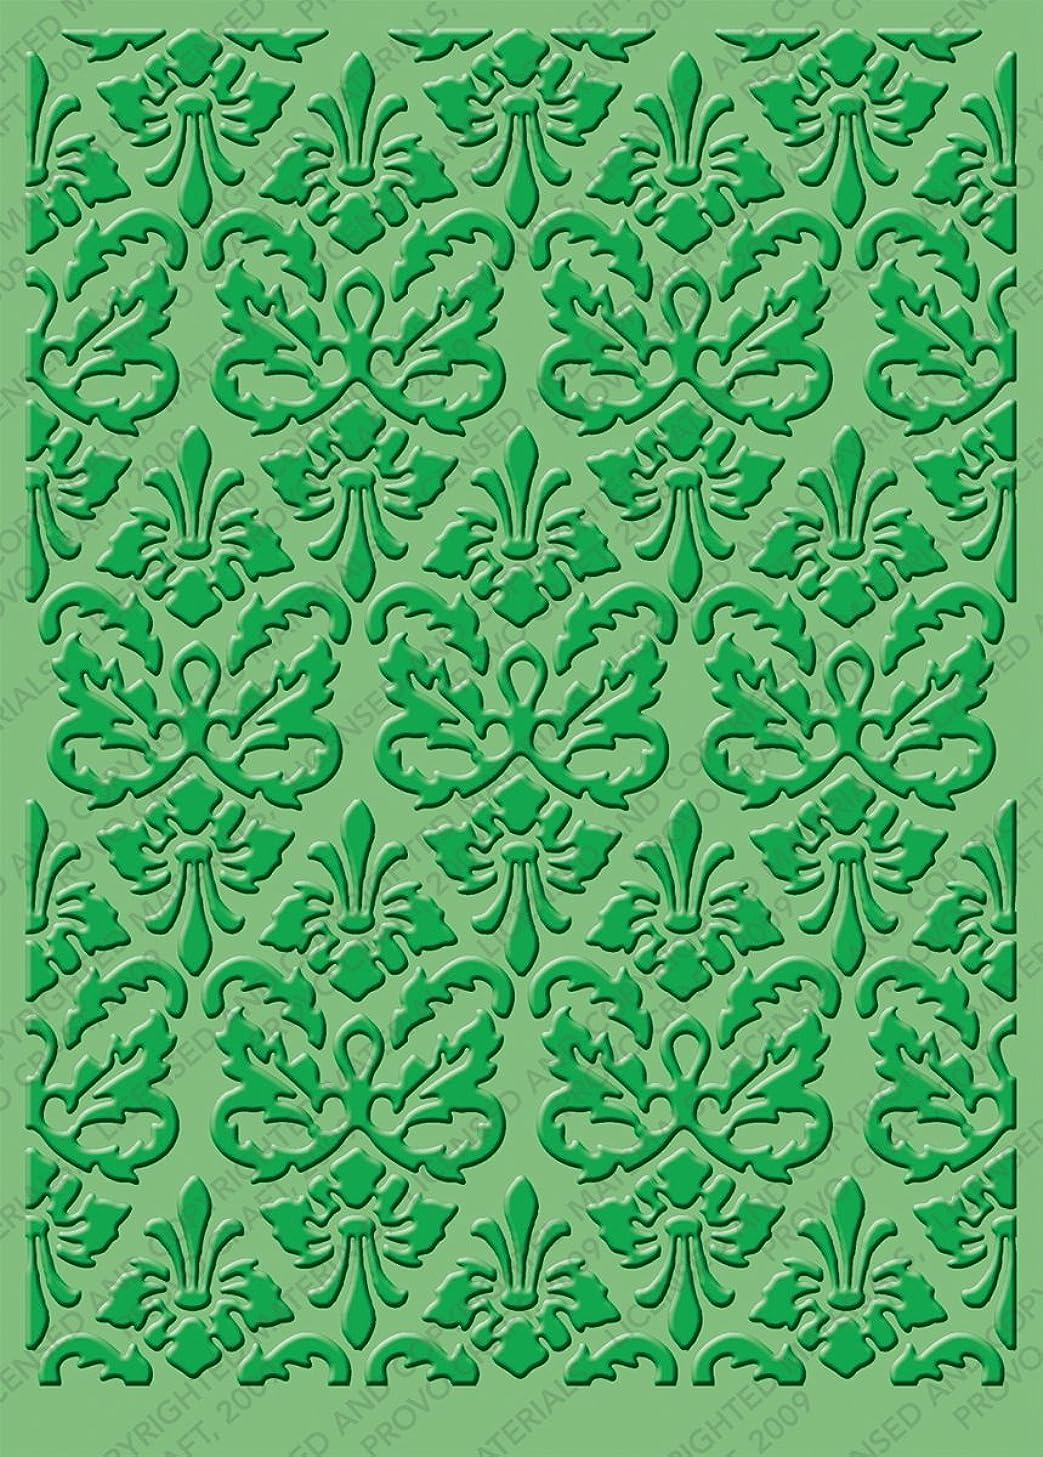 Cuttlebug 5-Inch-by-7-Inch Embossing Folder, Kassie's Brocade